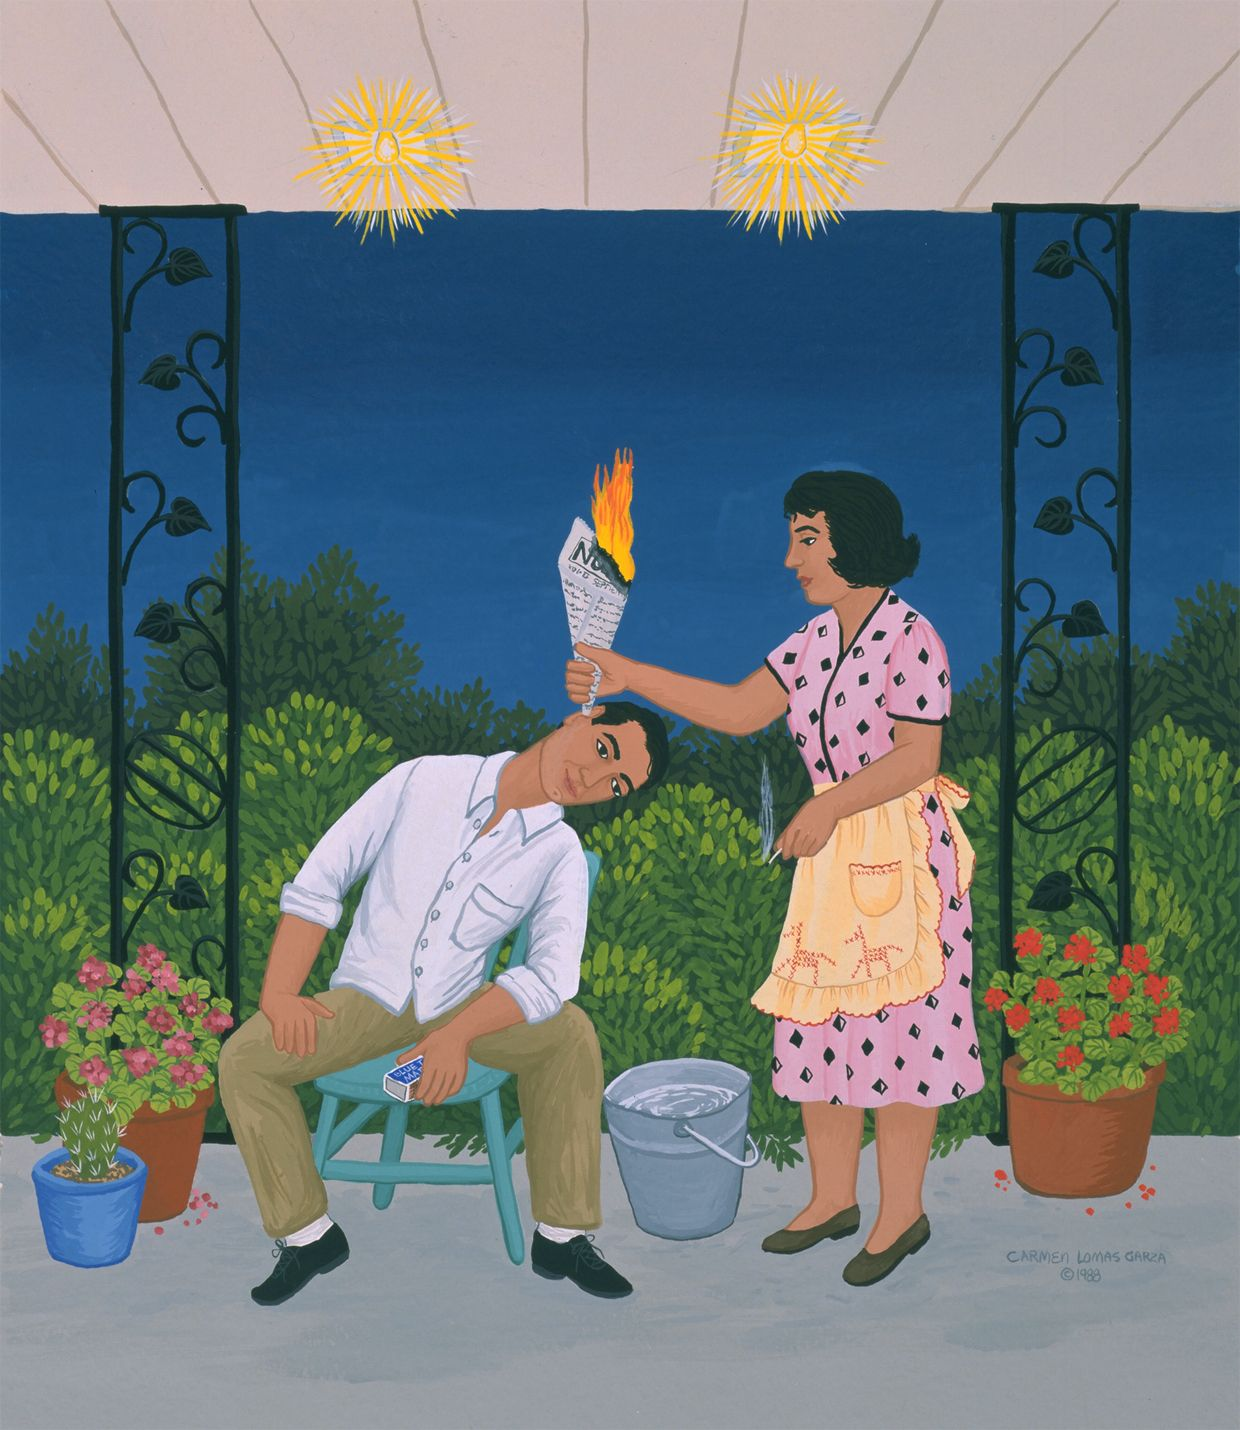 Carmen Lomas Garza | Hispanic Artists and Art | Pinterest | Carmen ...